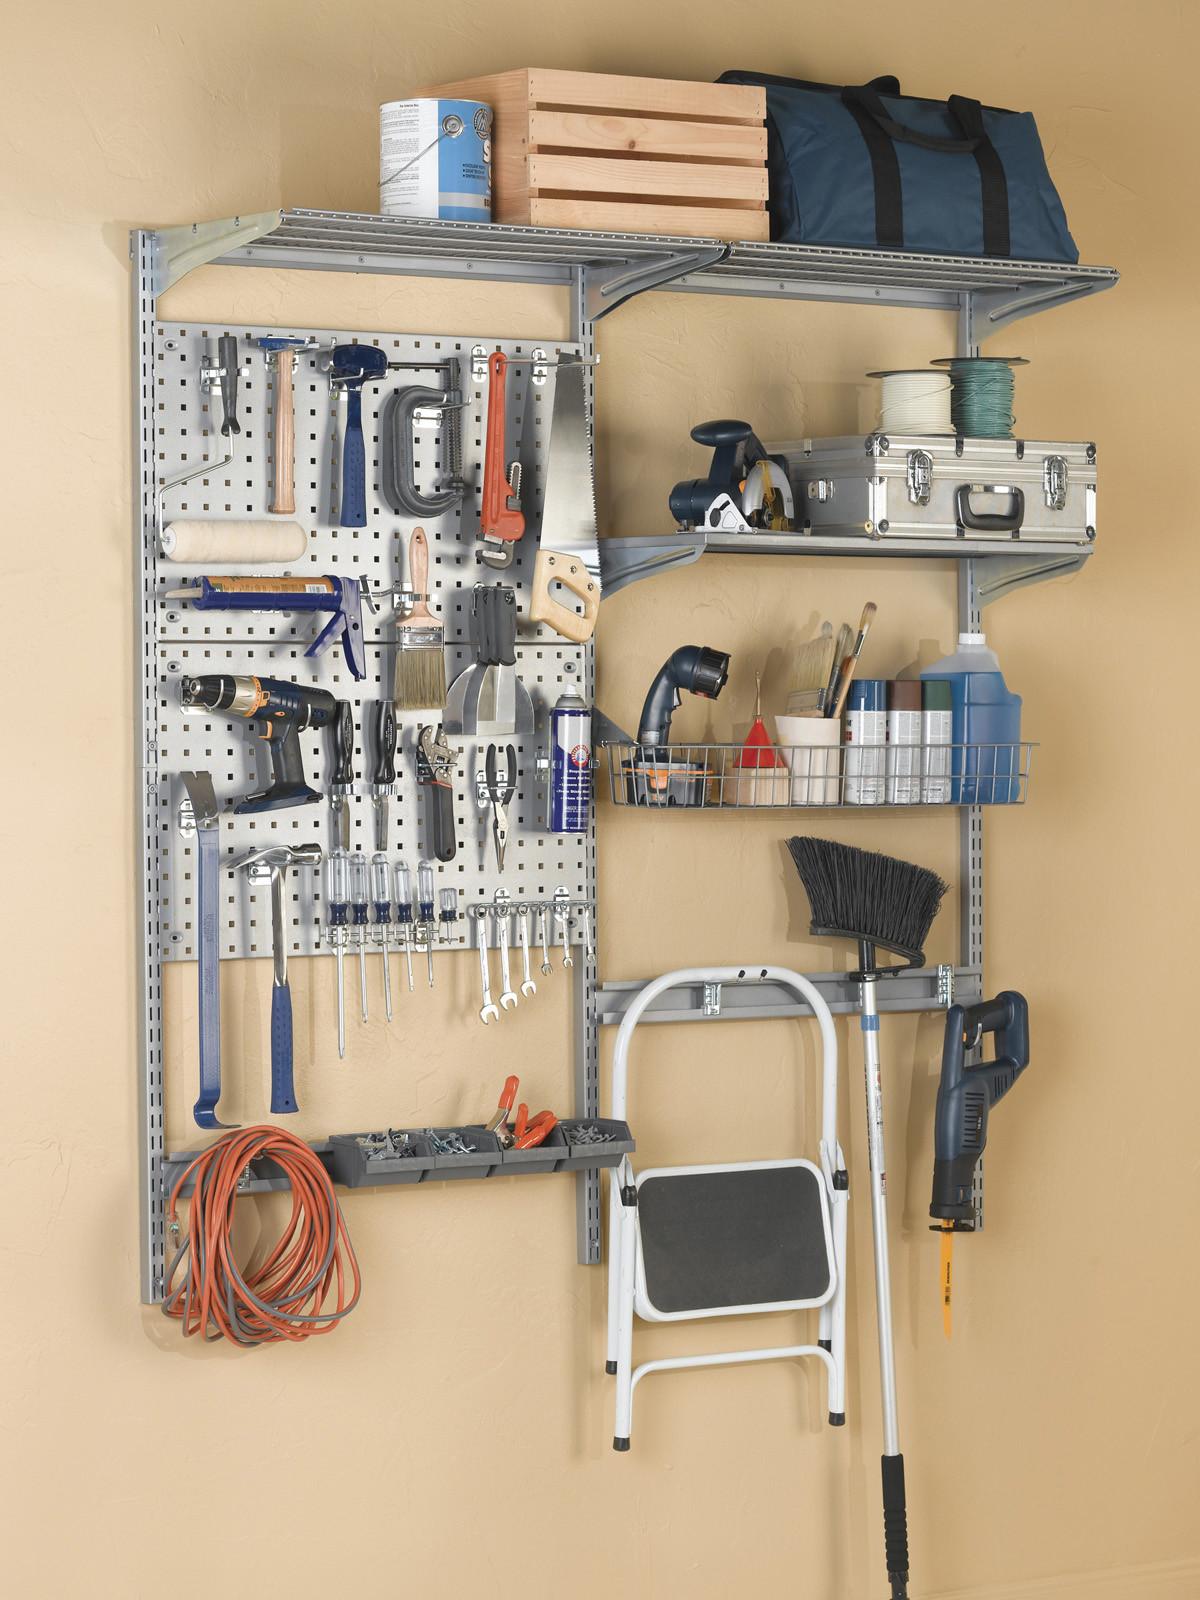 Garage Tool Organizer  Garage Wall Systems to Keep Tools Organized